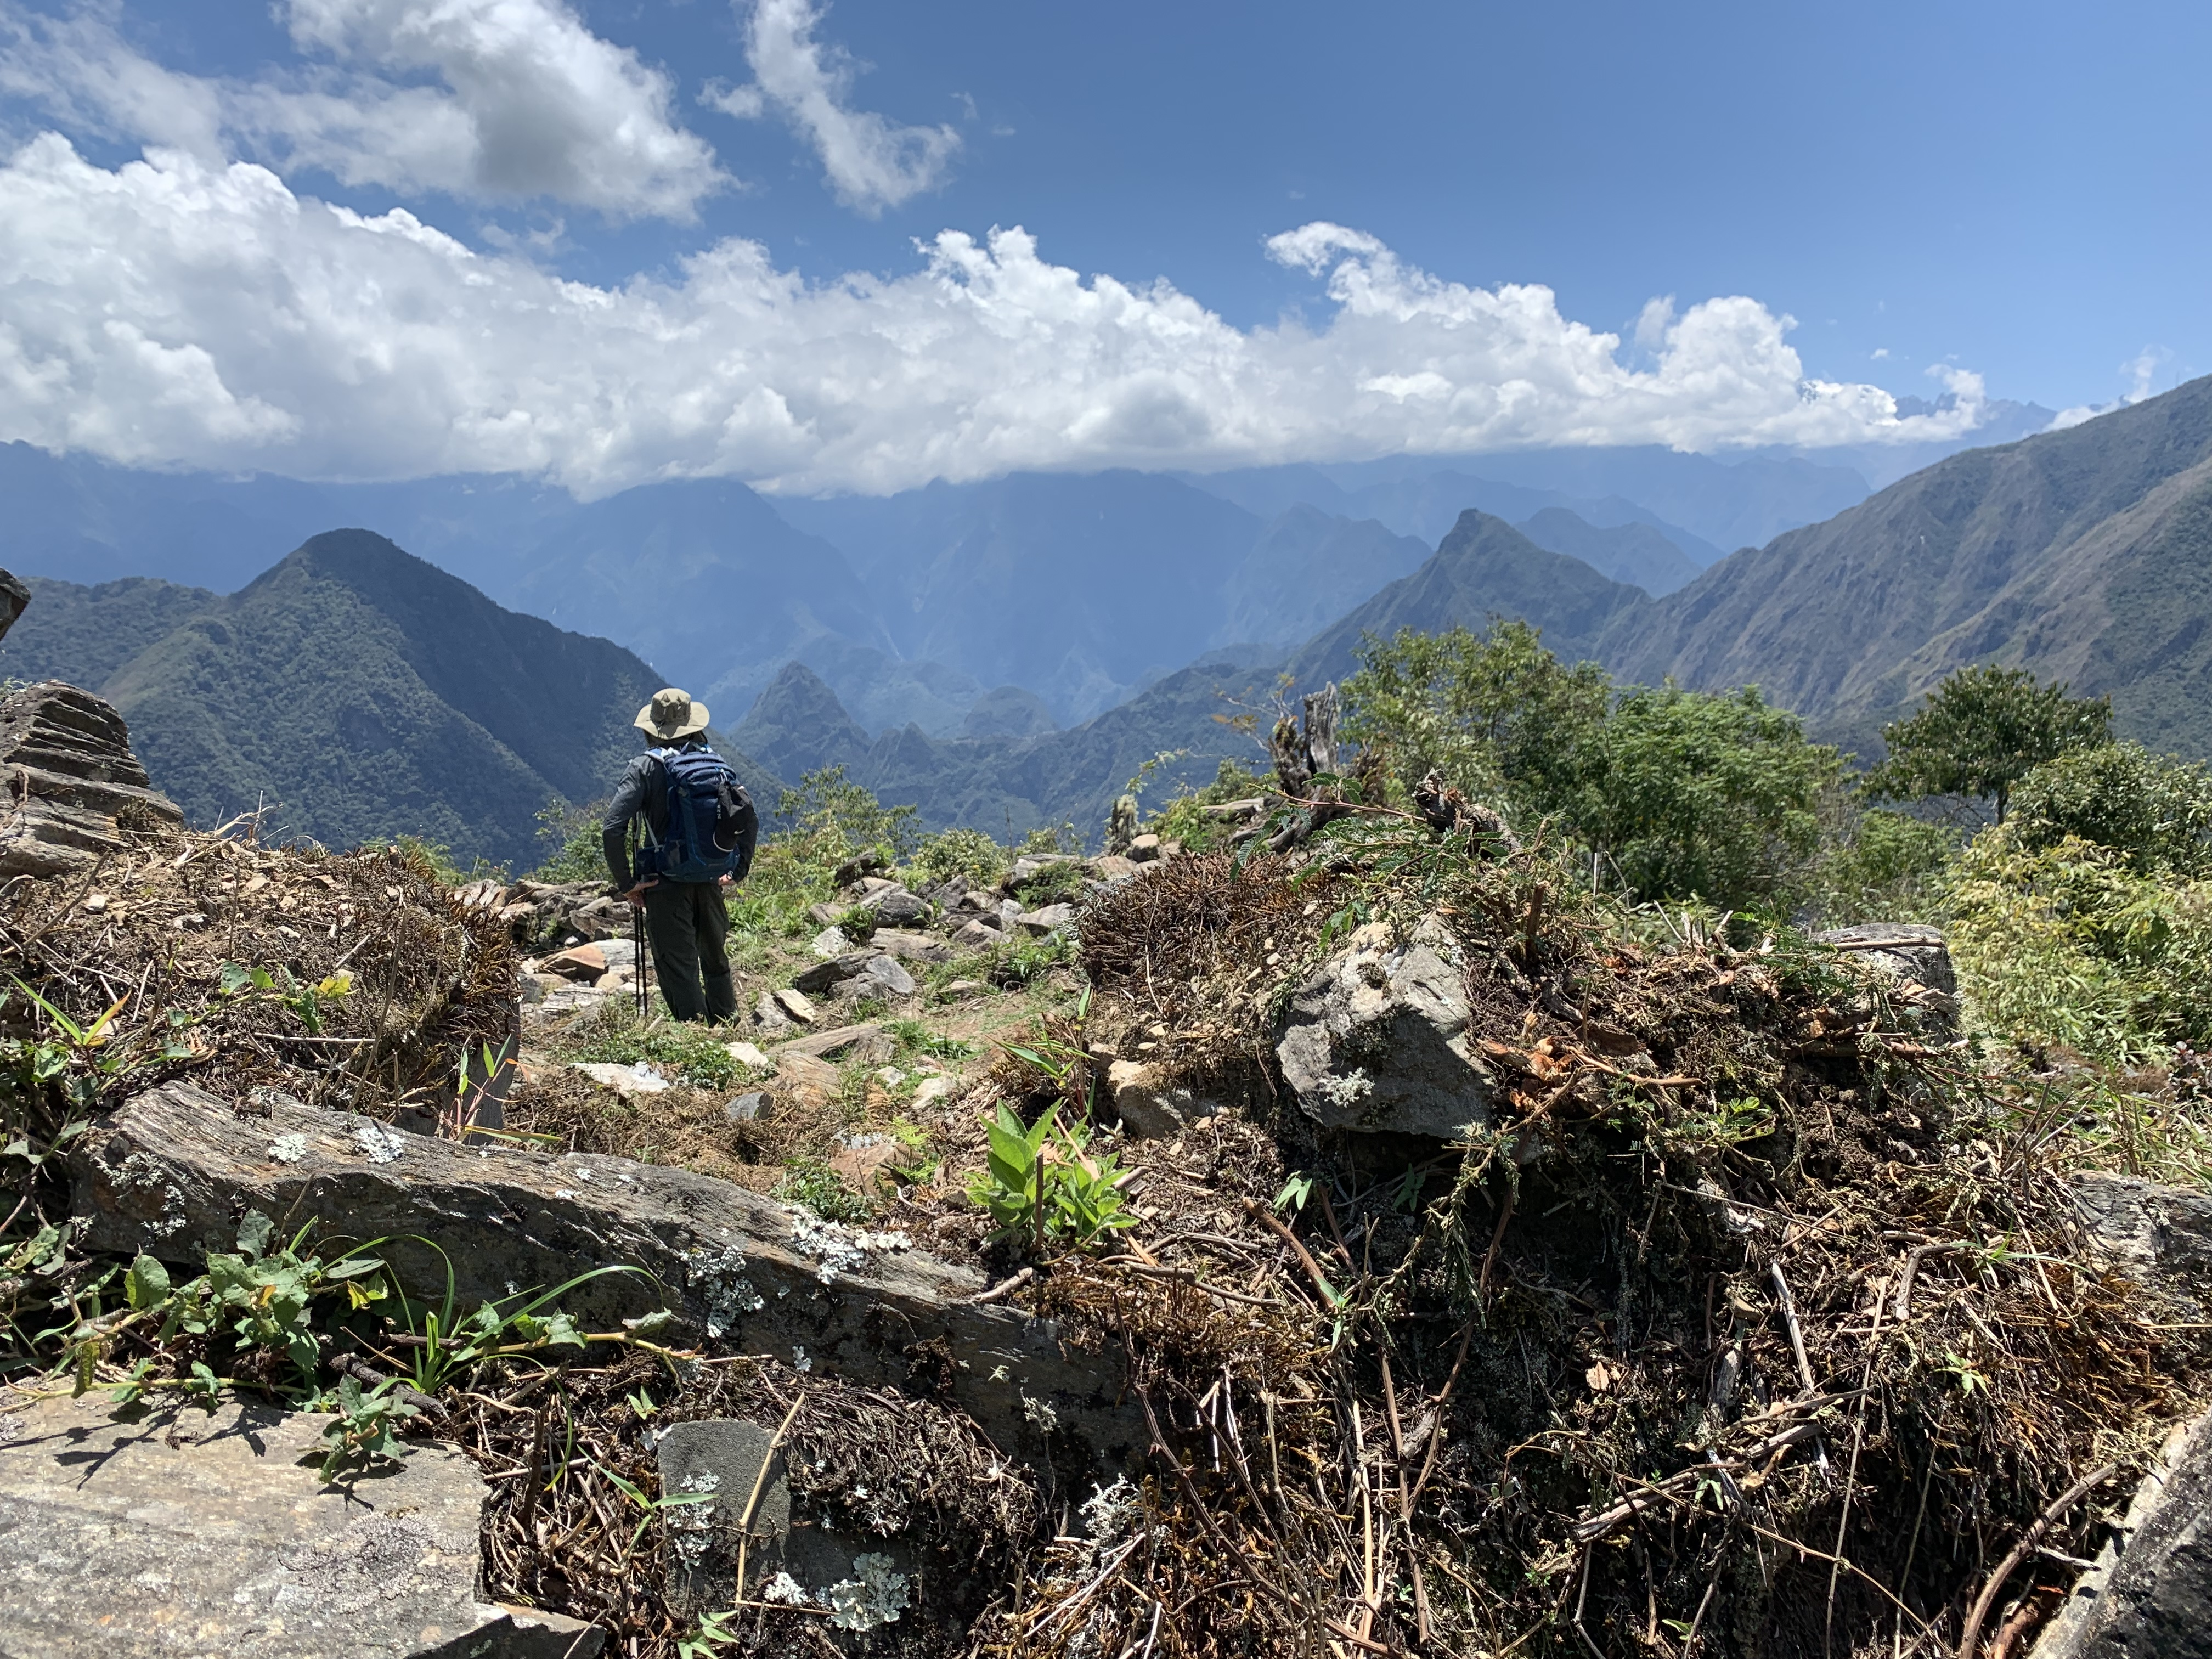 Salkantay Trek views of Machu Picchu